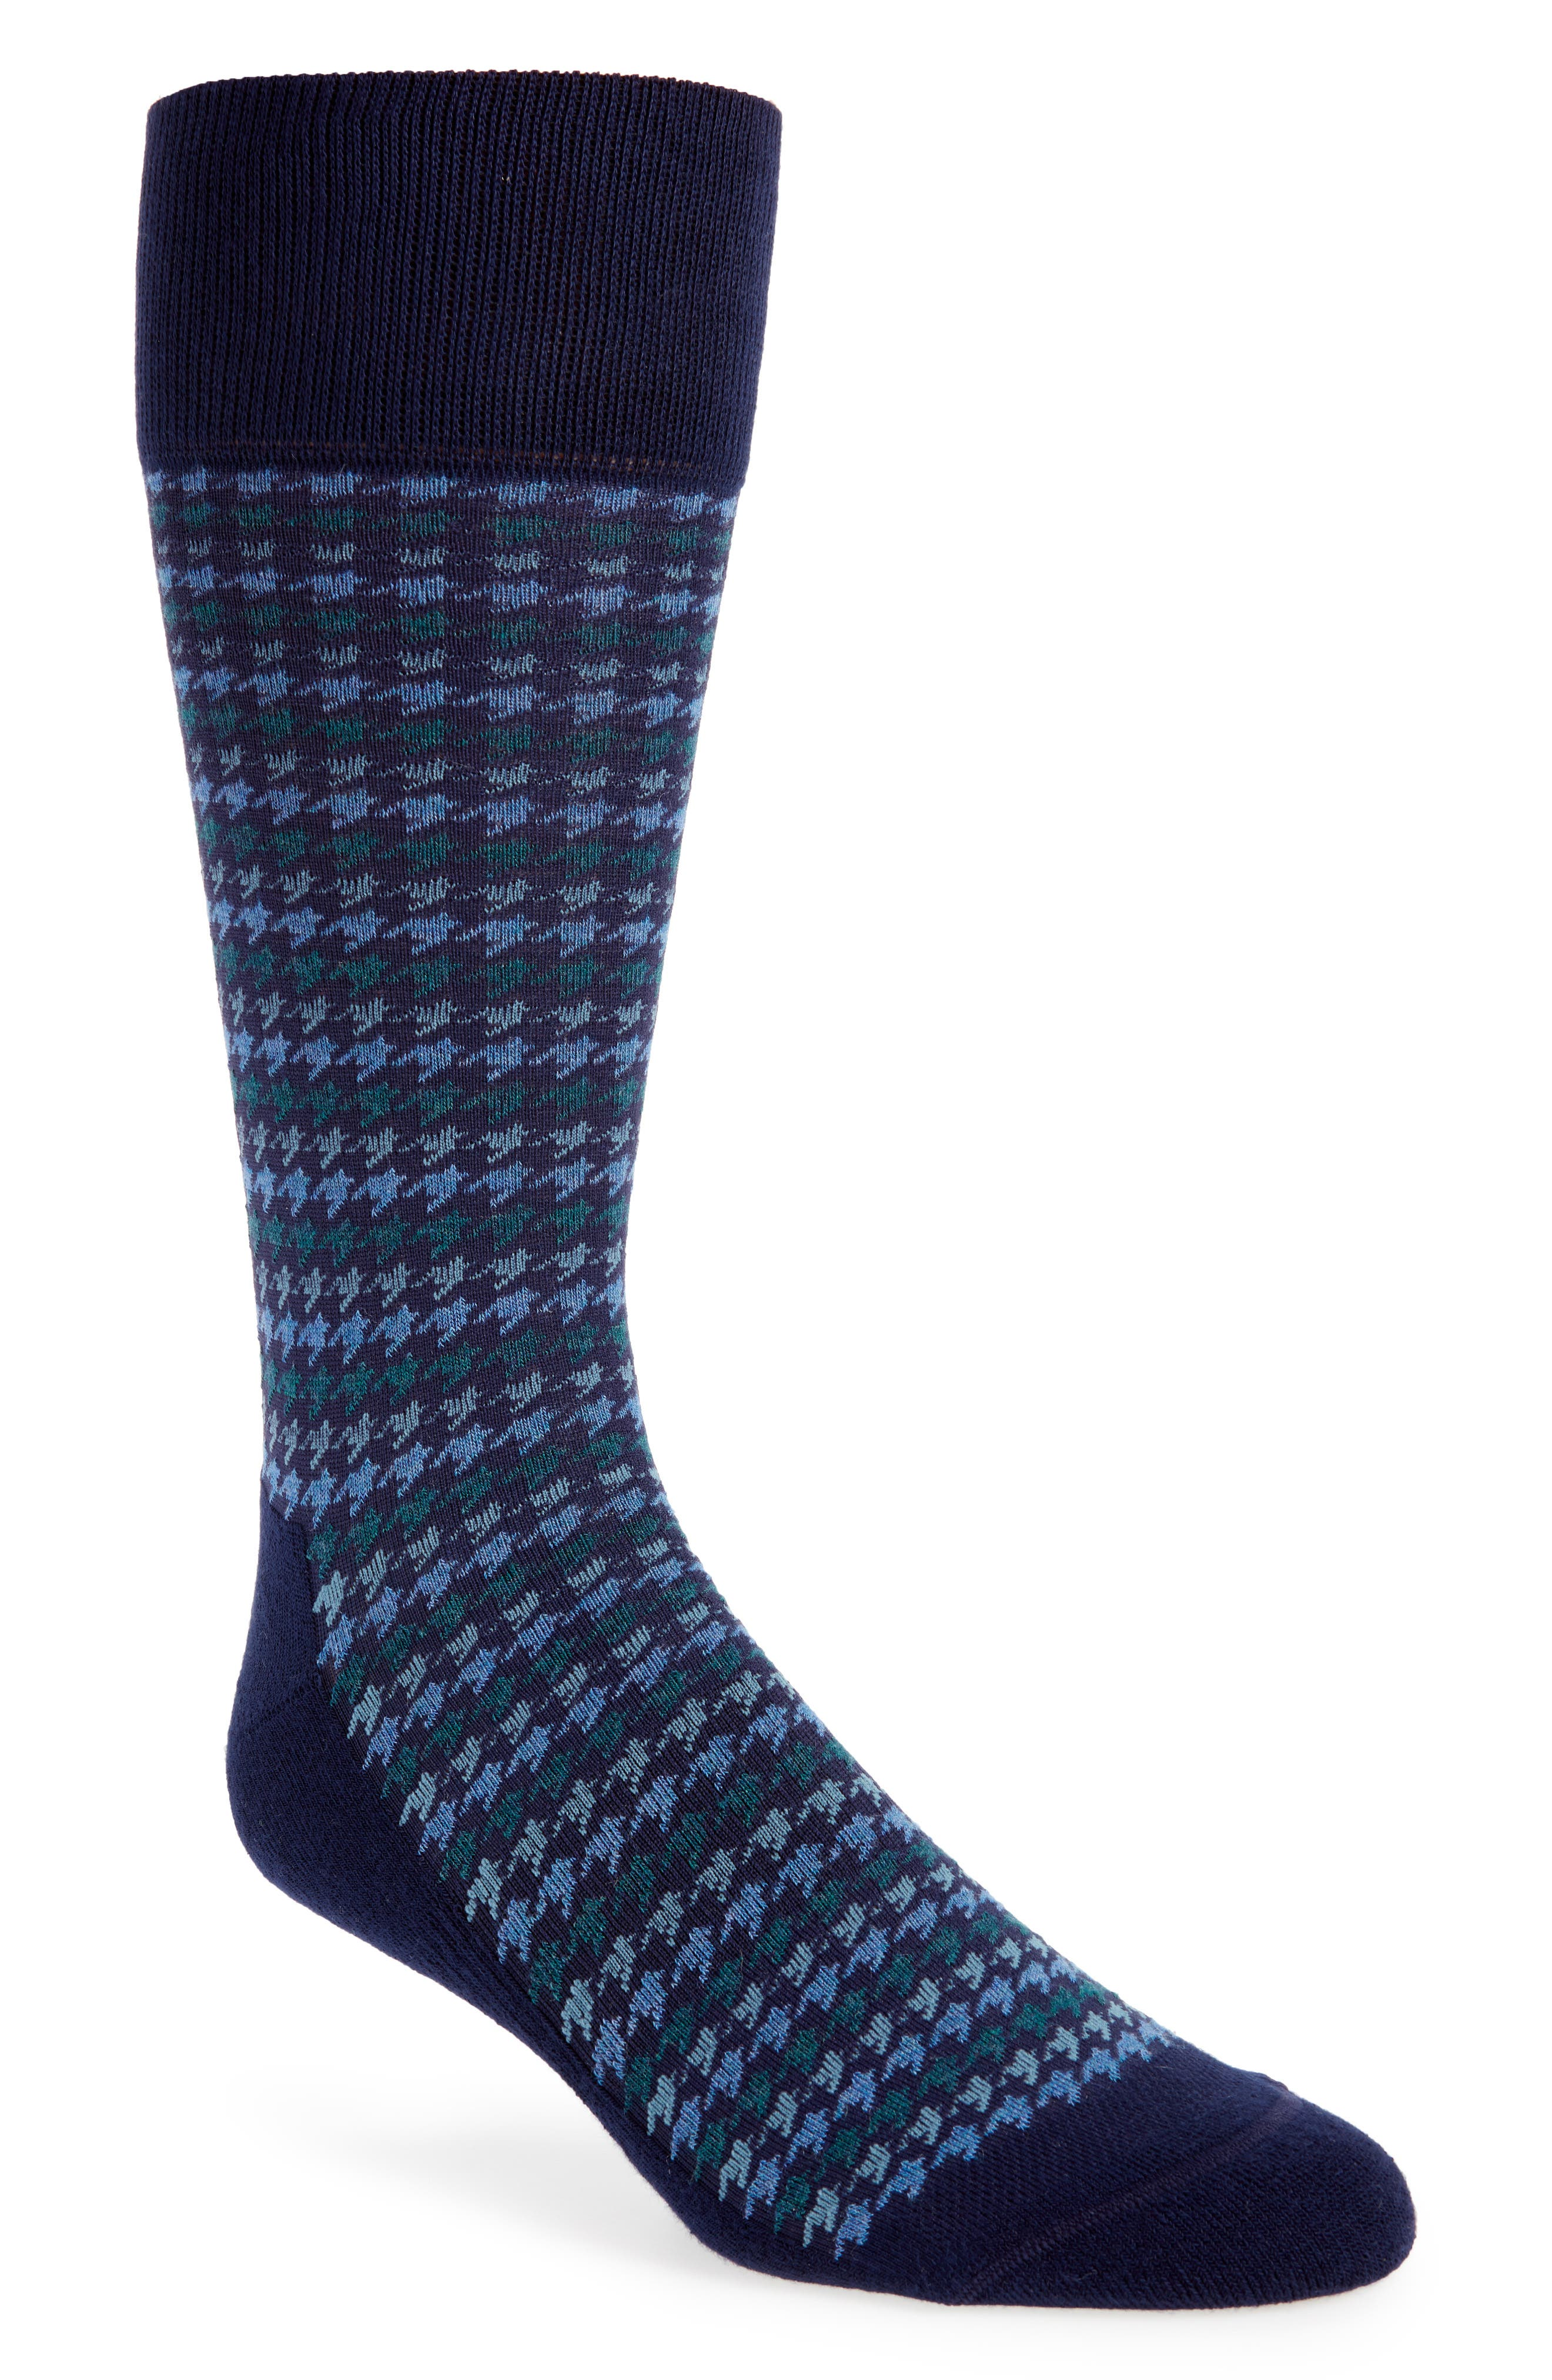 Houndstooth Stripe Socks,                         Main,                         color, Navy/ Blue